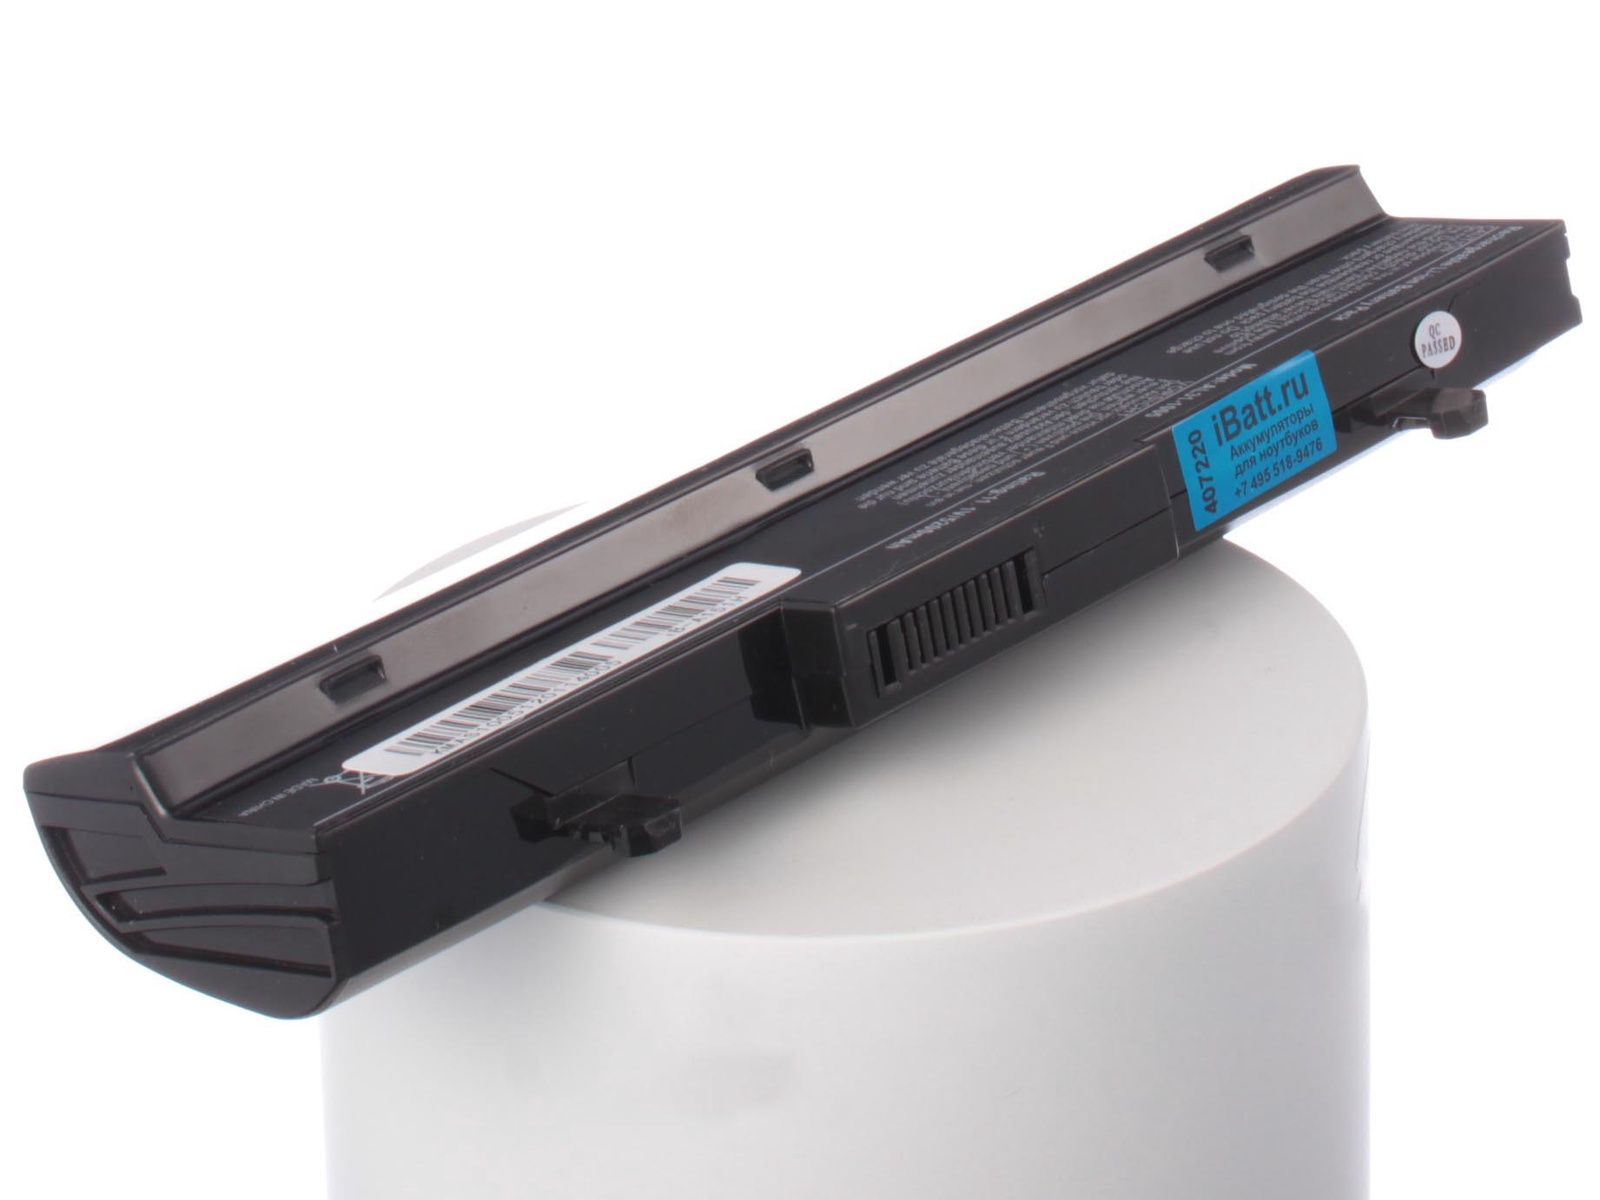 Фото - Аккумулятор для ноутбука iBatt для Asus Eee PC 1001PX, Eee PC 1001PXD, Eee PC 1001, Eee PC 1005PXD, Eee PC 1005P, Eee PC 1005, Eee PC 1005HA, Eee PC 1005HA-A, Eee PC 1101HA, Eee PC 1001P, Eee PC 1001HA, Eee PC 1005PX аккумуляторная батарея topon top 1005h 5200мач для ноутбуков asus eee pc 1001px 1001ha 1005ha 1005hag 1005he 1005hr 1005peb 1101ha